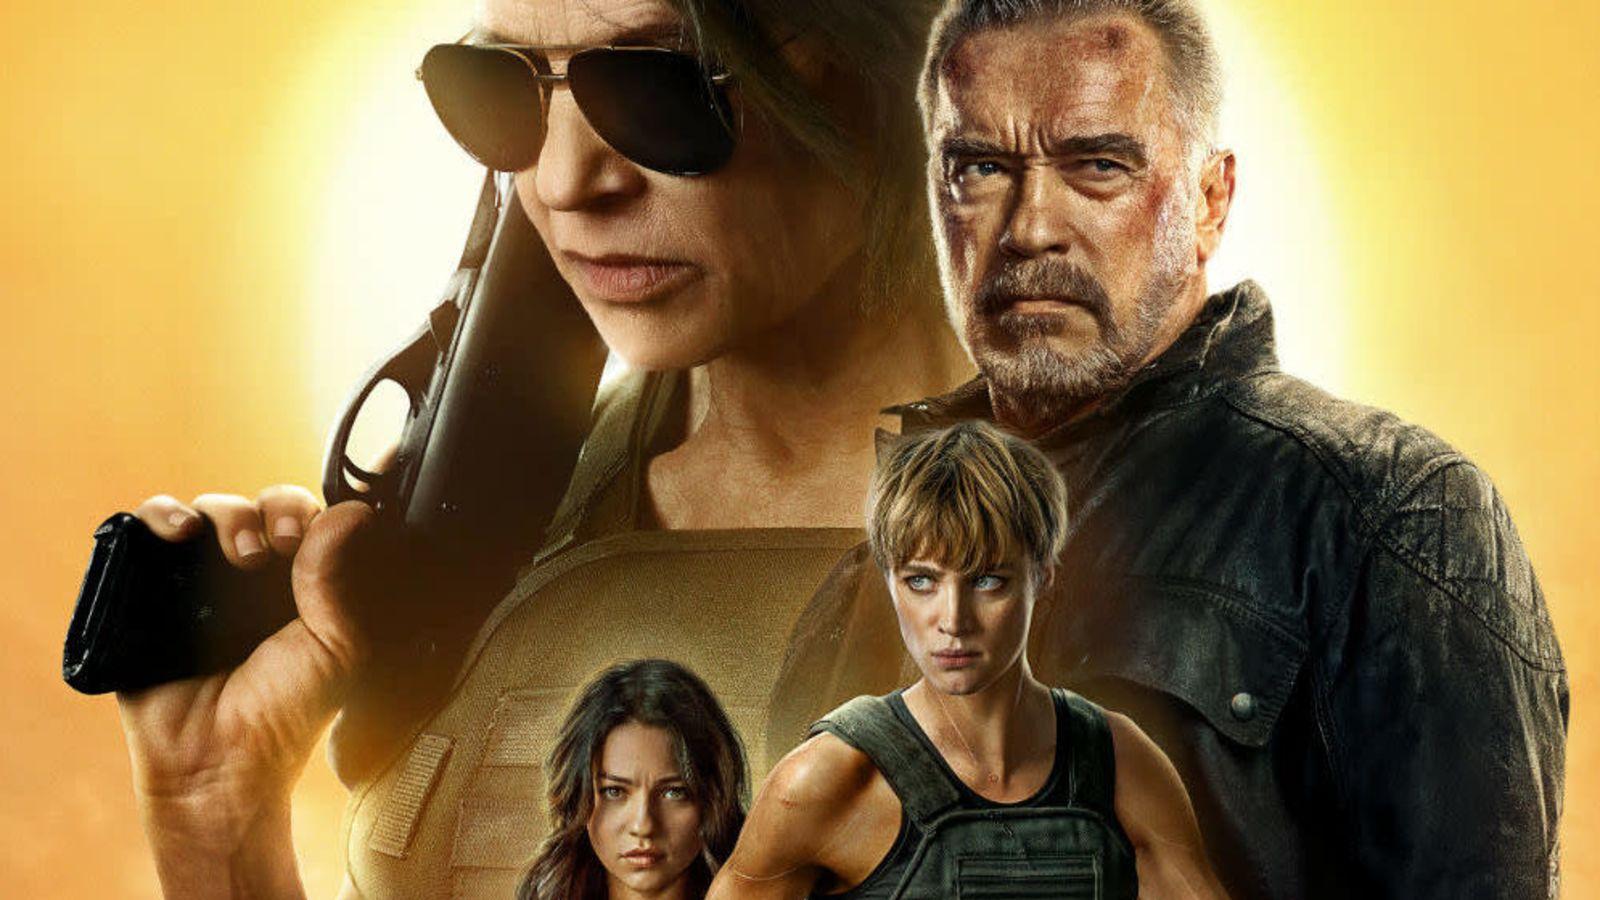 Terminator: Dark Fate emociona con tráiler repleto de acción